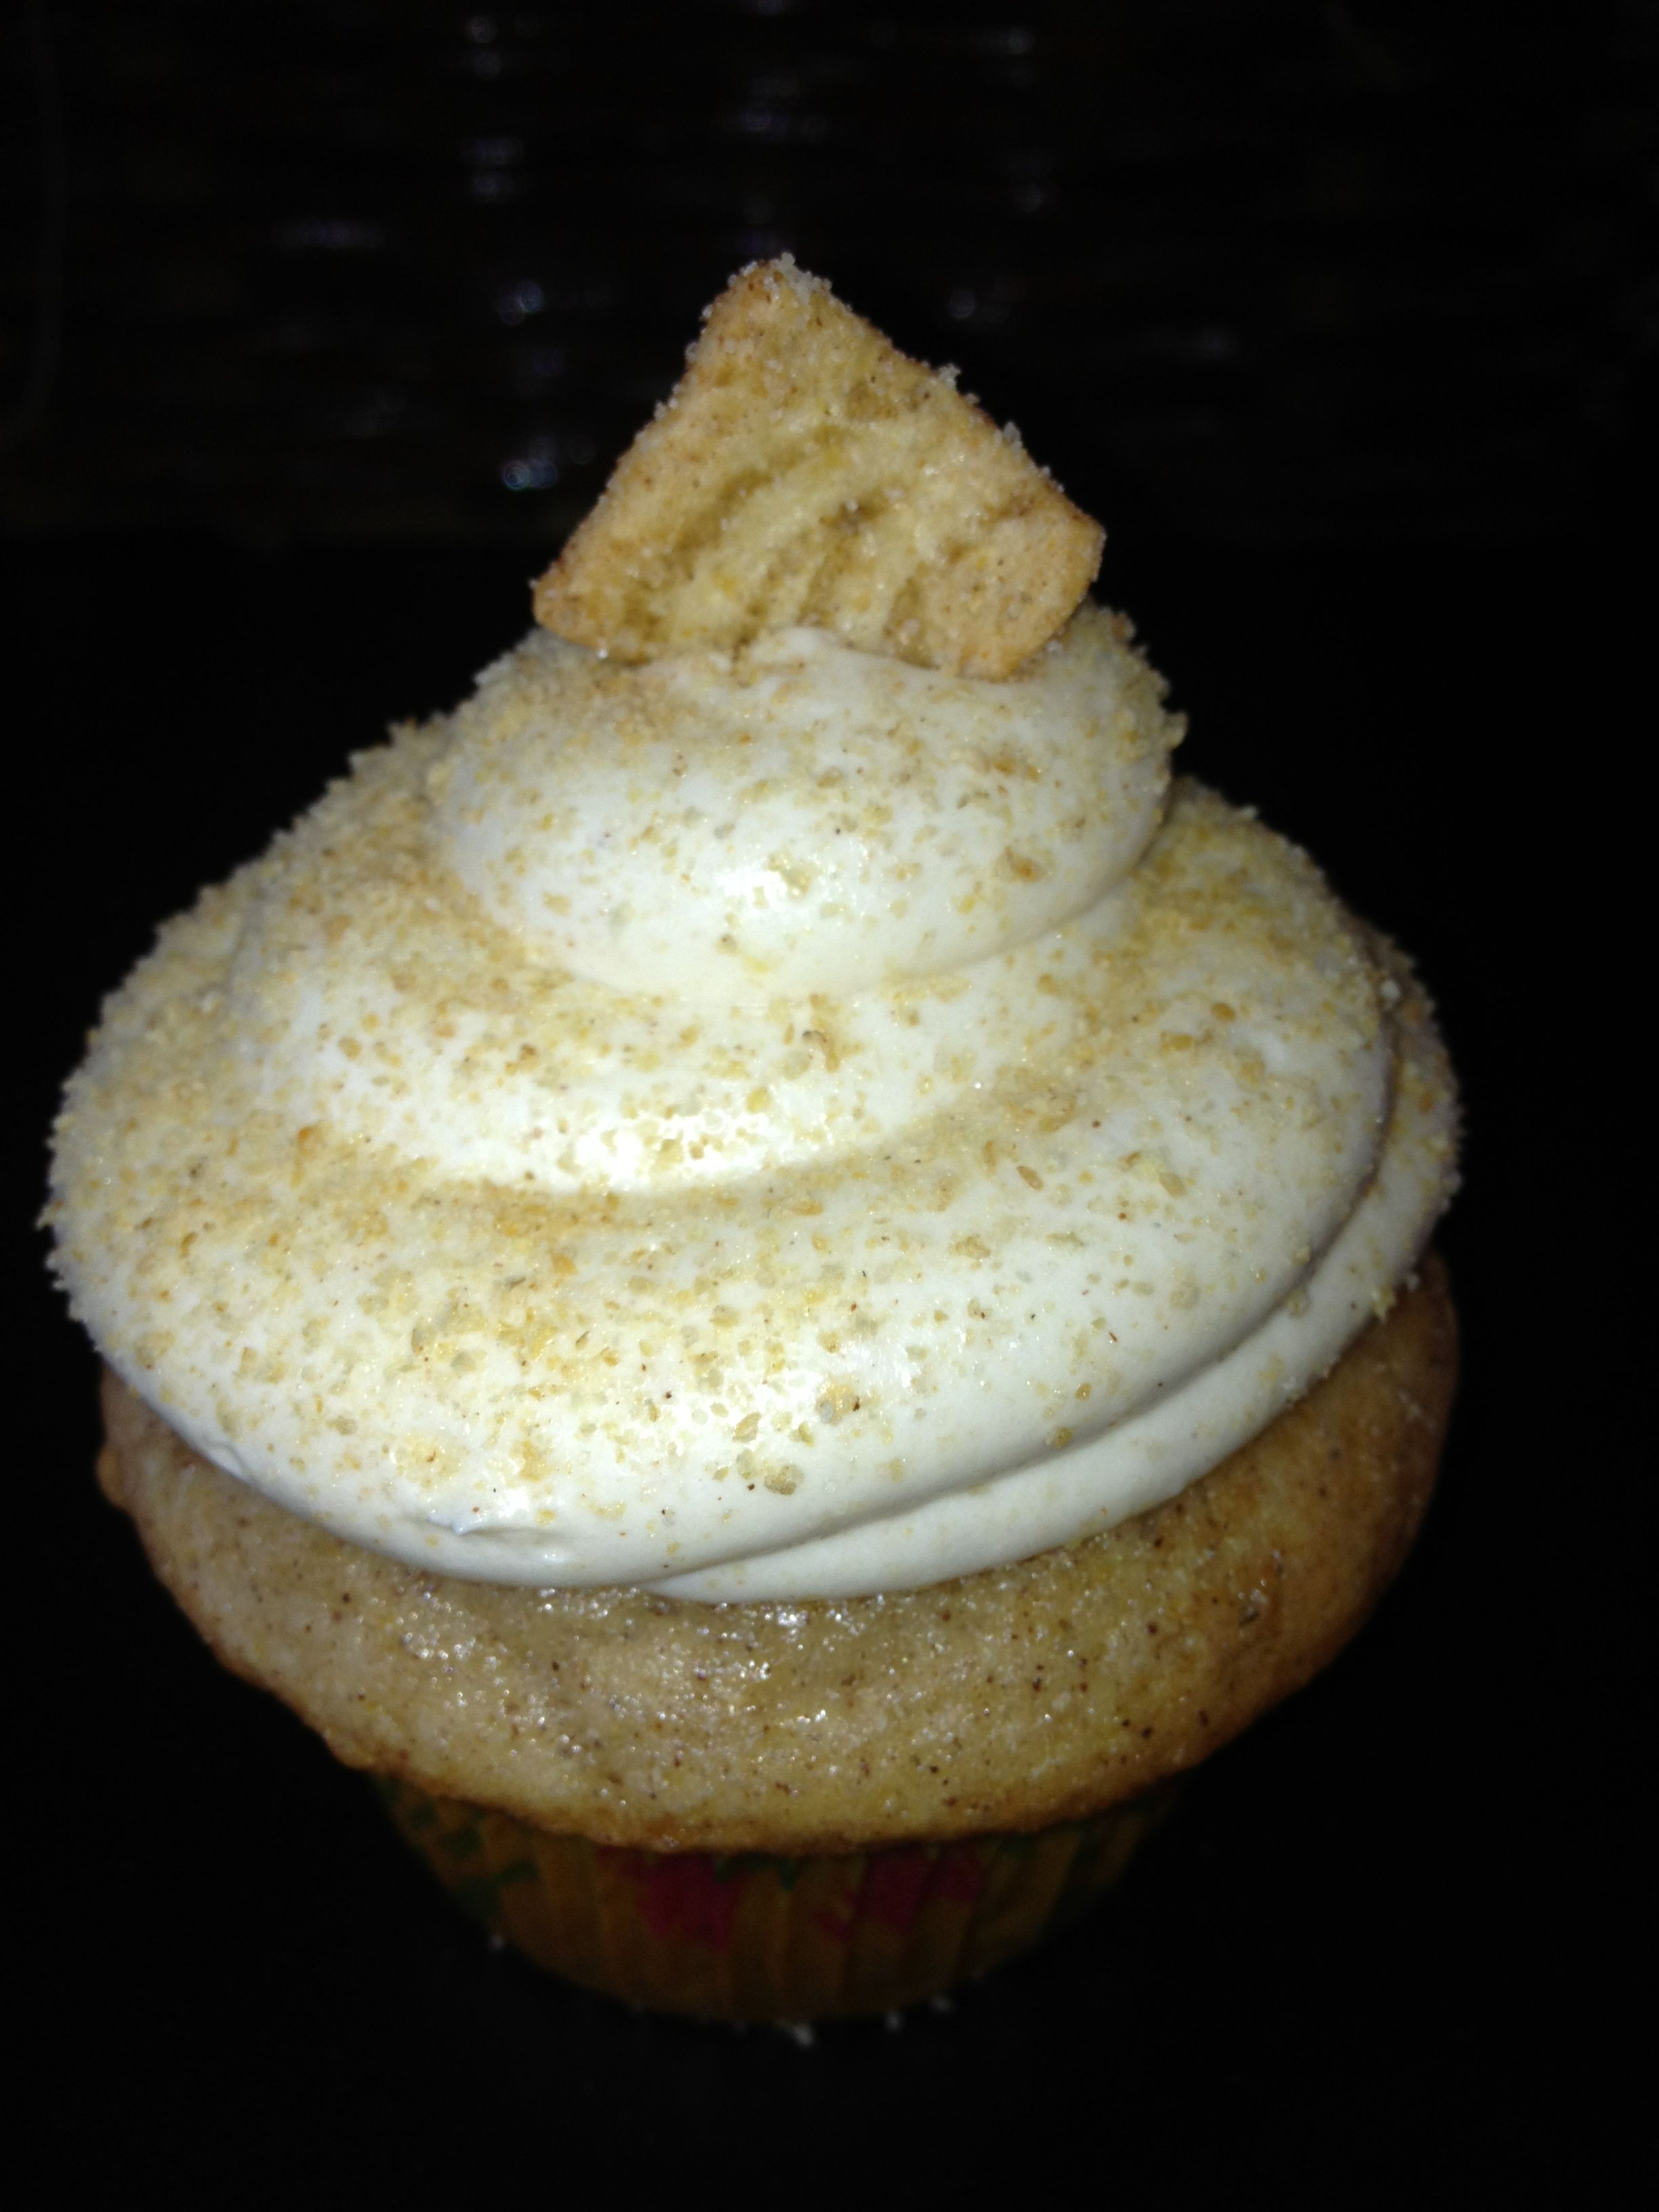 Cinnamon toast crunch cinnamon cake with a cream cheese